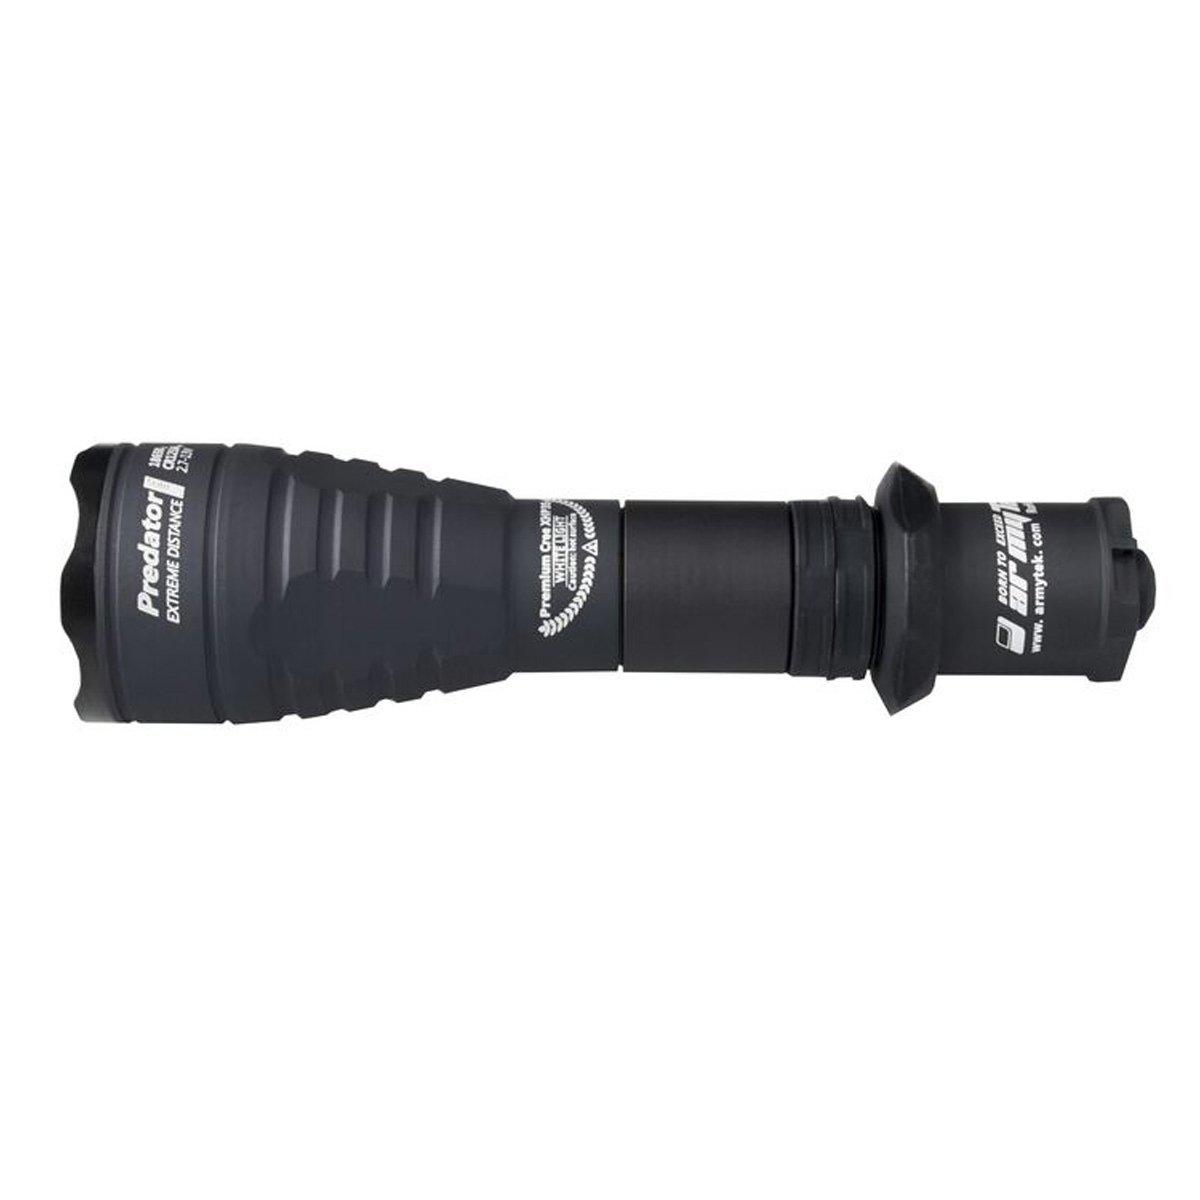 Armytek PROTator Pro XHP35 HI LED (warm) - 1570 LED Lumen - Taschenlampe mit Holster, Clip & Schlaufe